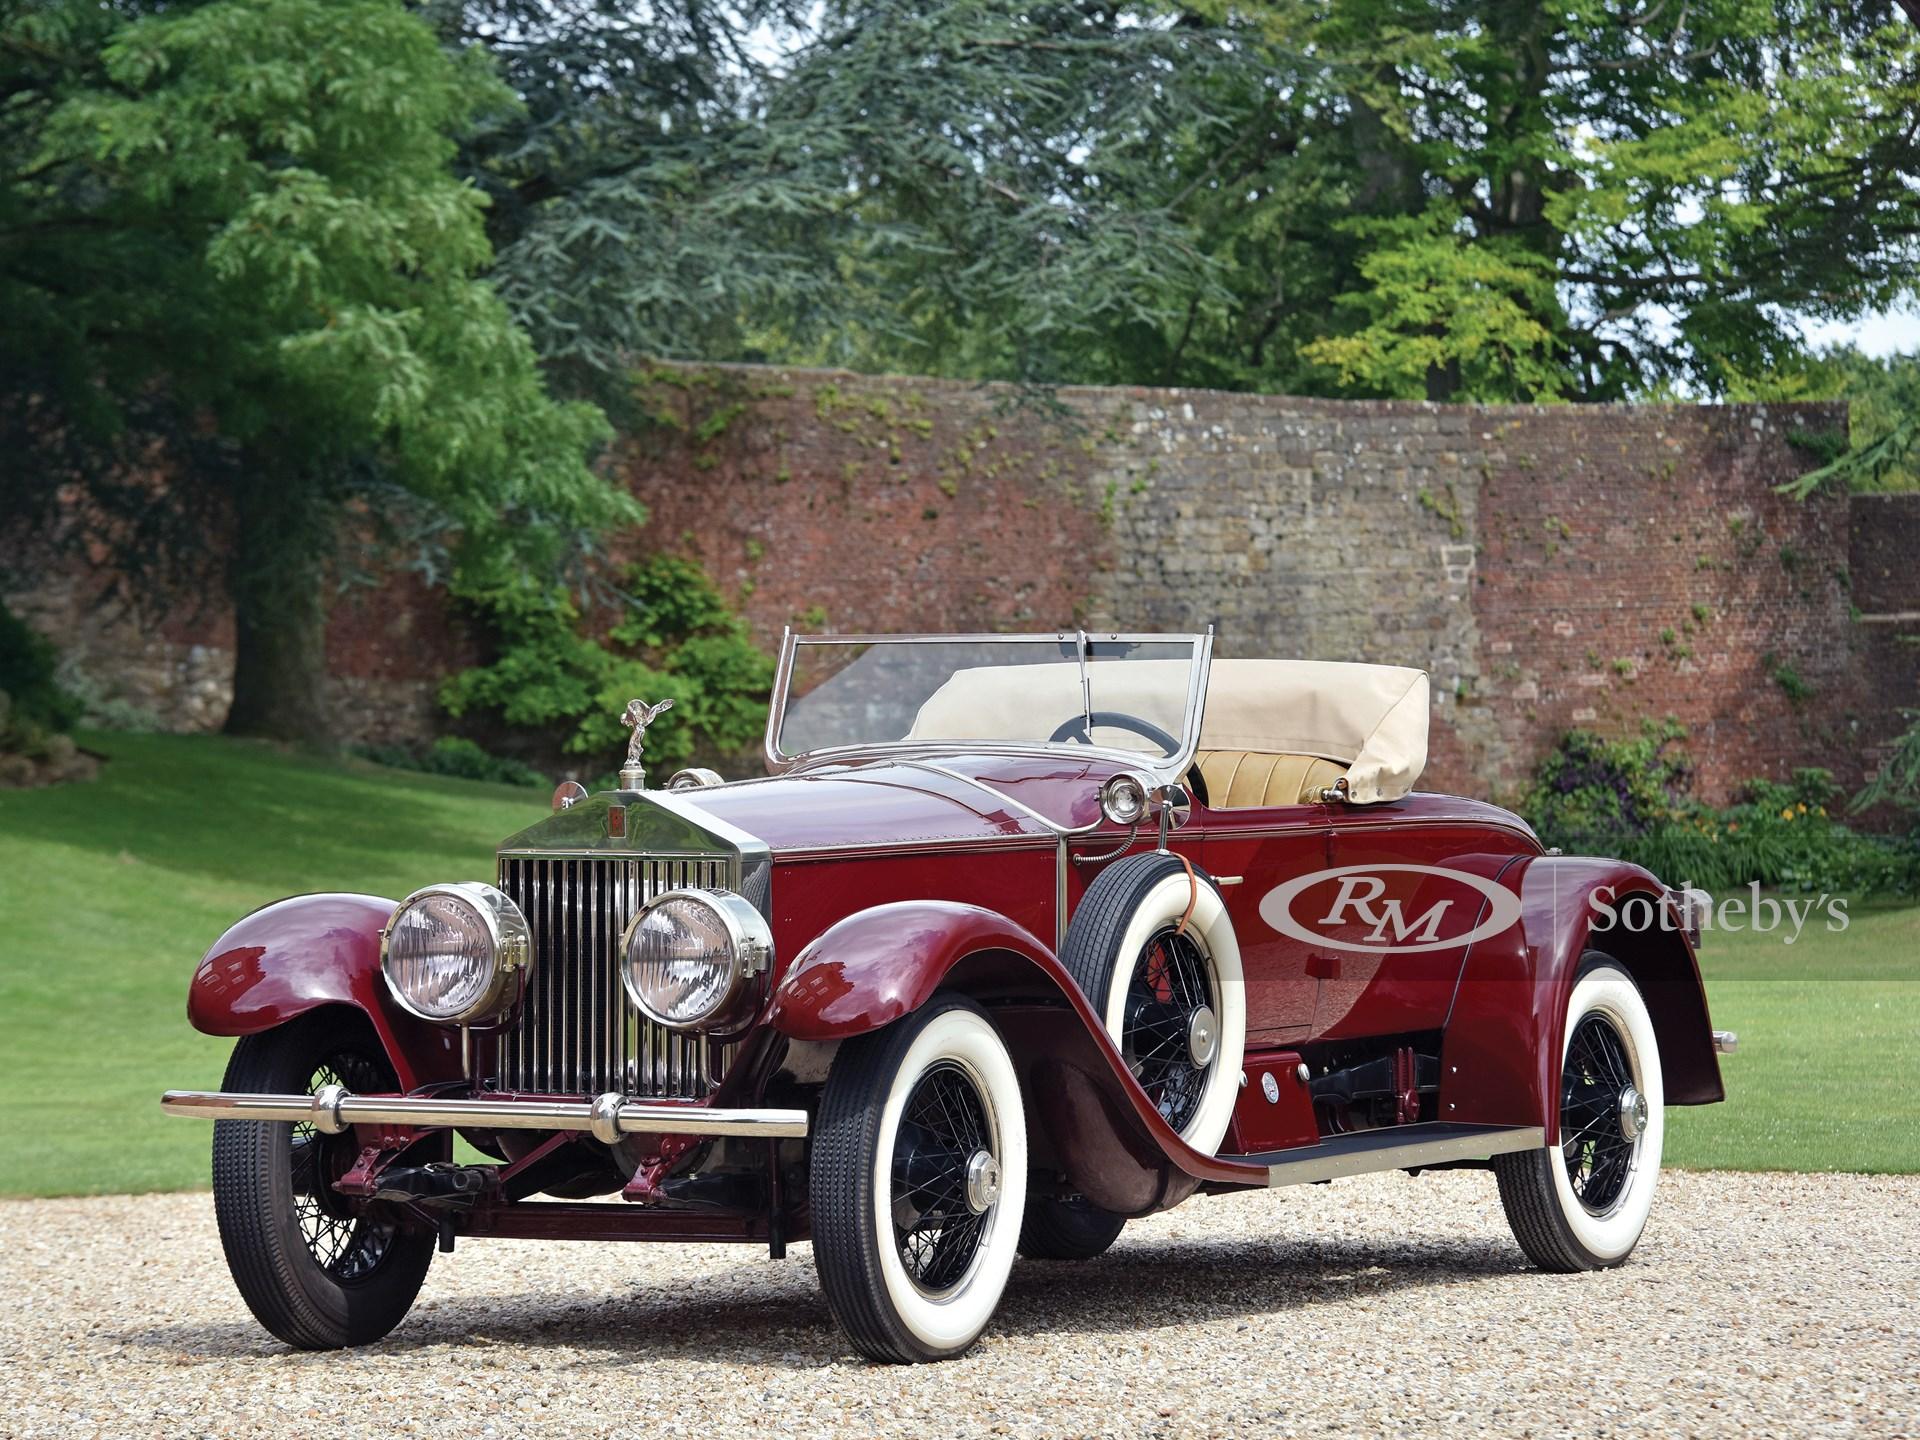 1926 rolls royce silver ghost piccadilly roadster by rolls royce custom coach work london 2016 rm sotheby s 1926 rolls royce silver ghost